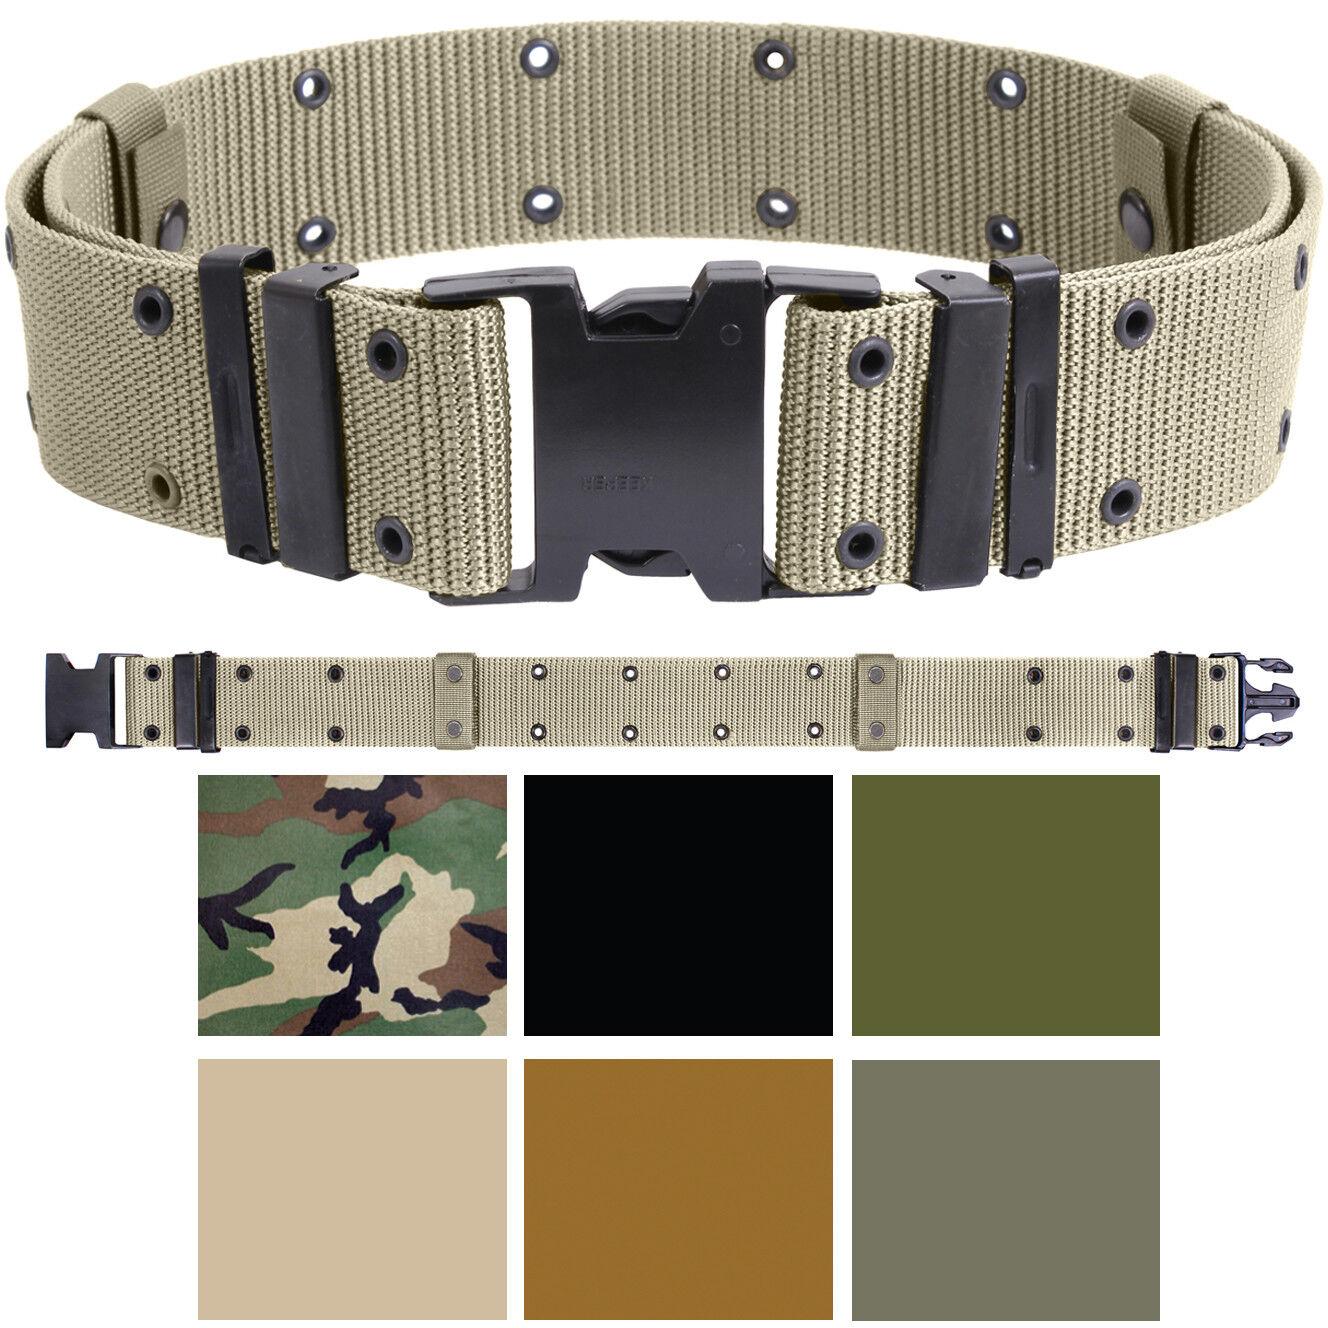 Military Pistol Belt Nylon Tactical Web Utility Duty ALICE Marine Corps GI Type Belts